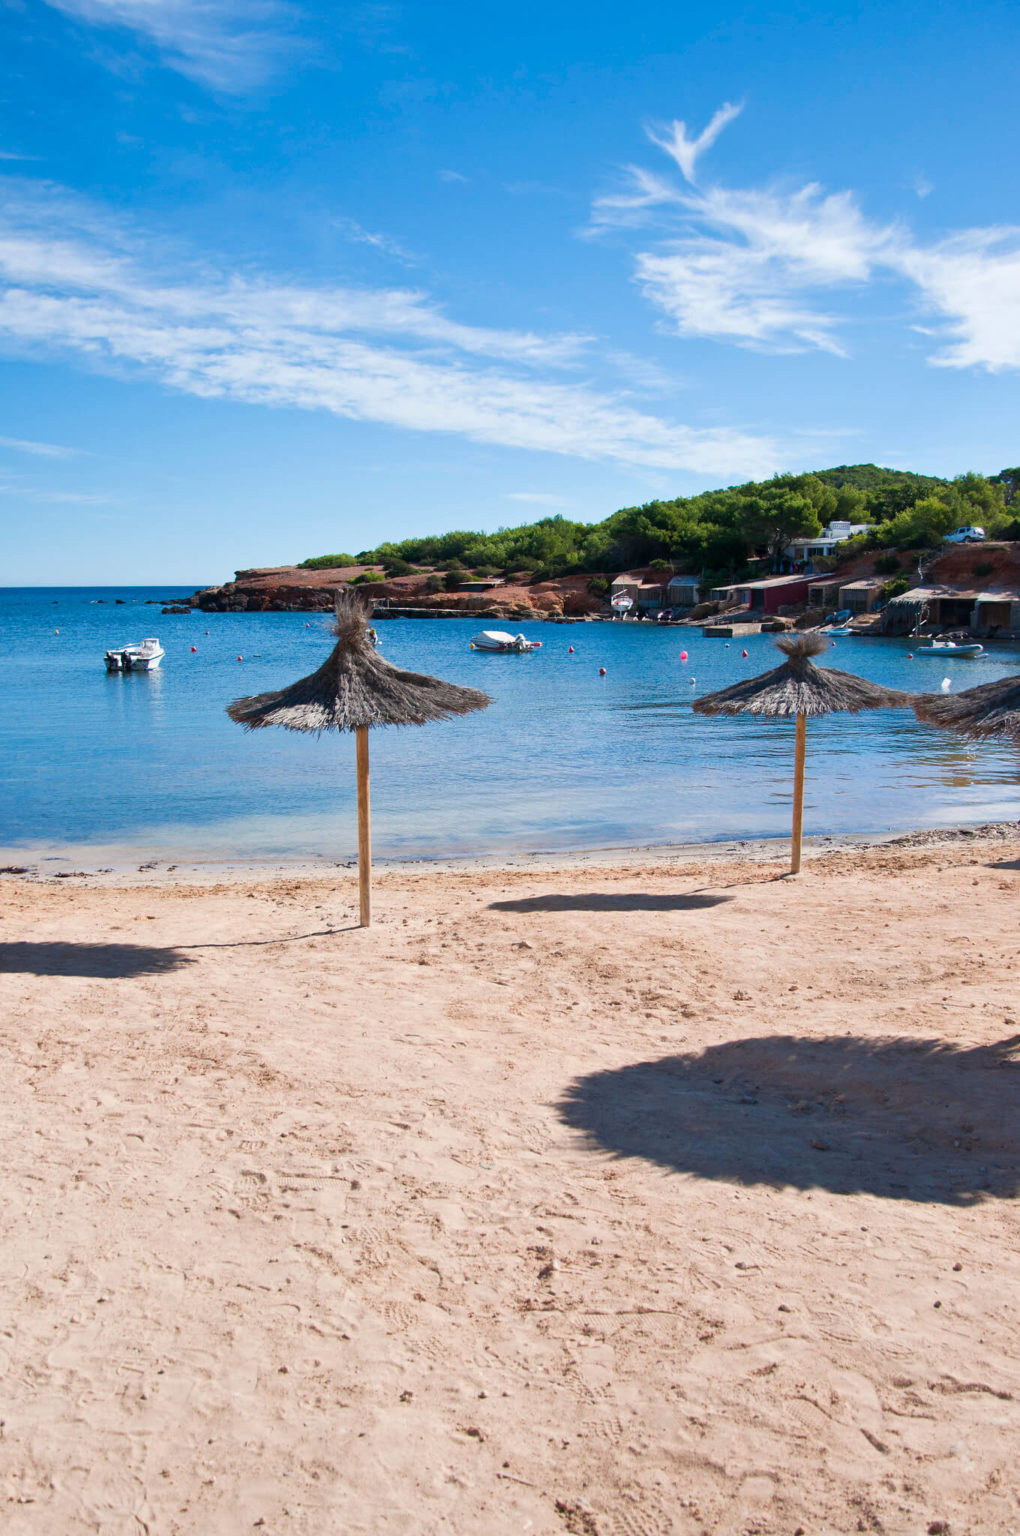 https://www.white-ibiza.com/wp-content/uploads/2020/03/ibiza-beaches-pou-des-lleo-03-1020x1536.jpg